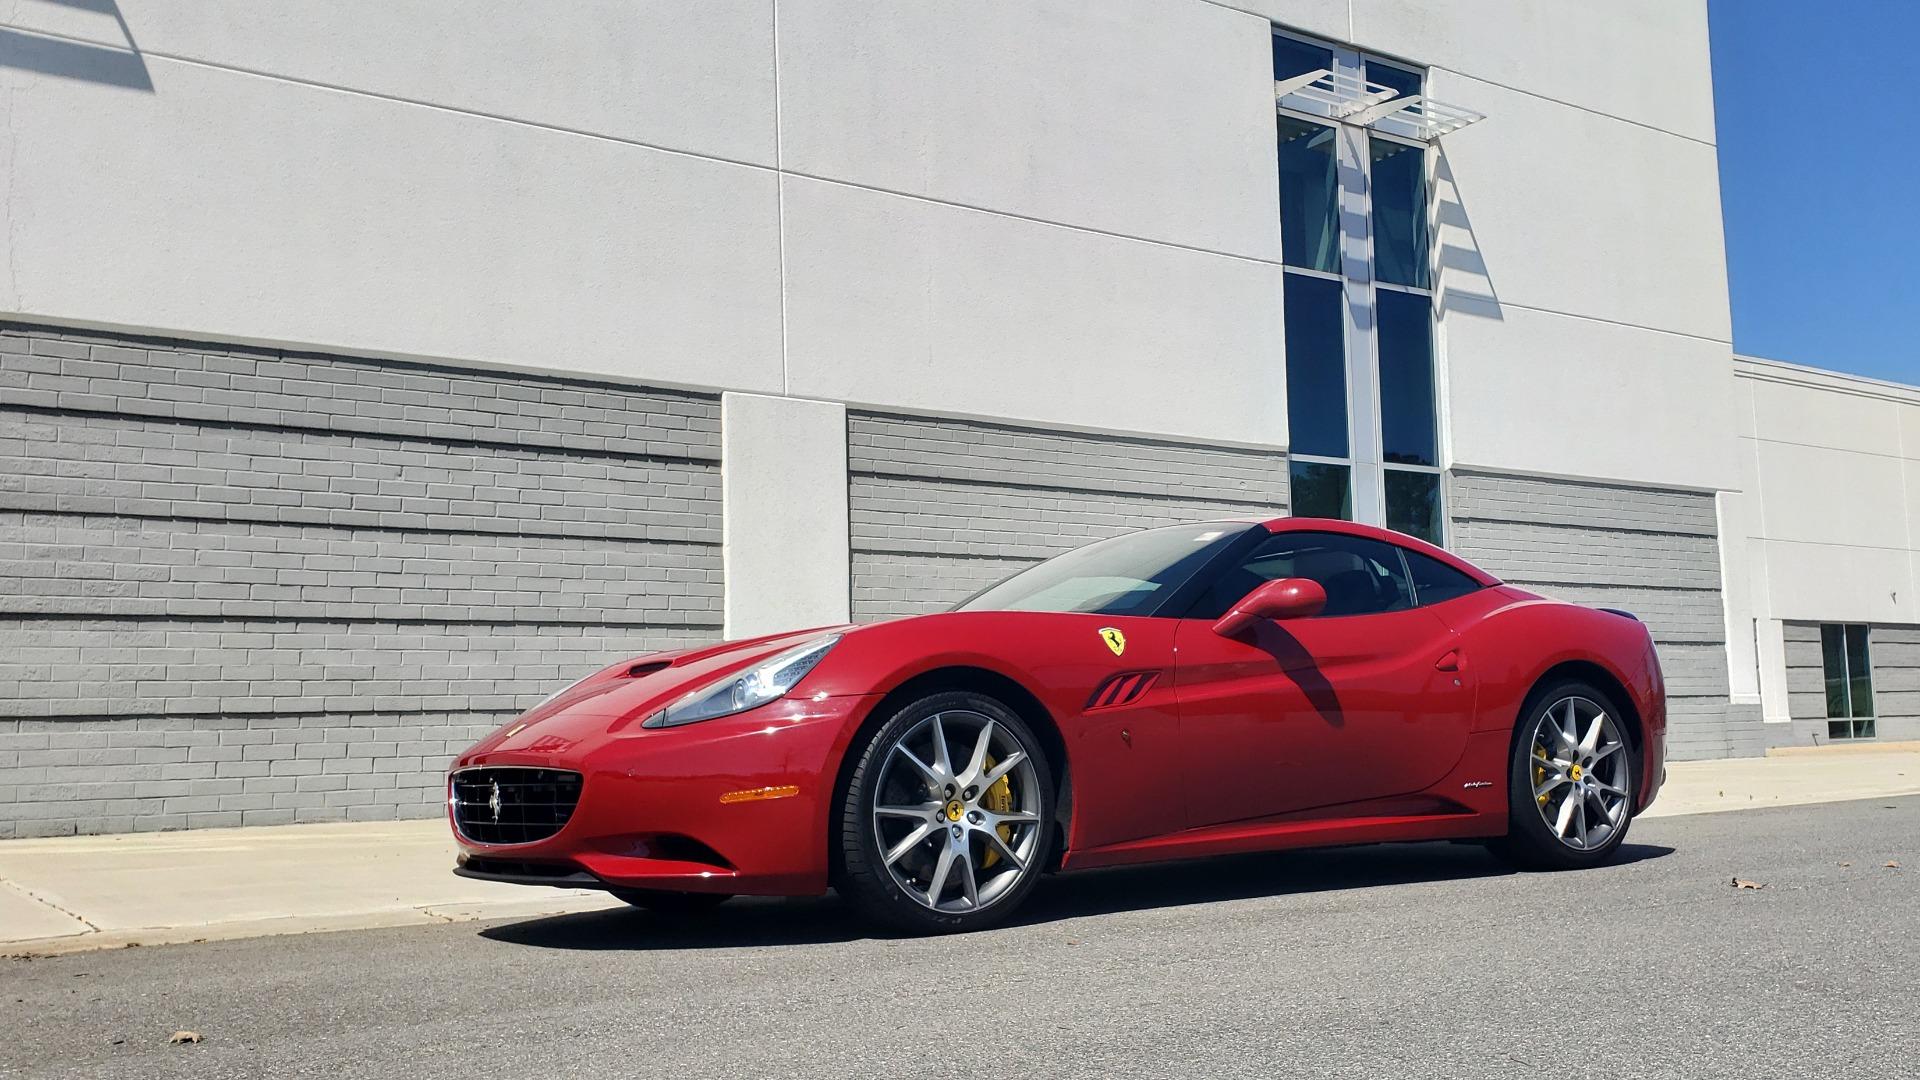 Used 2014 Ferrari CALIFORNIA CONVERTIBLE 2+2 / NAV / PARK SENS / CAMERA / TPMS for sale Sold at Formula Imports in Charlotte NC 28227 4